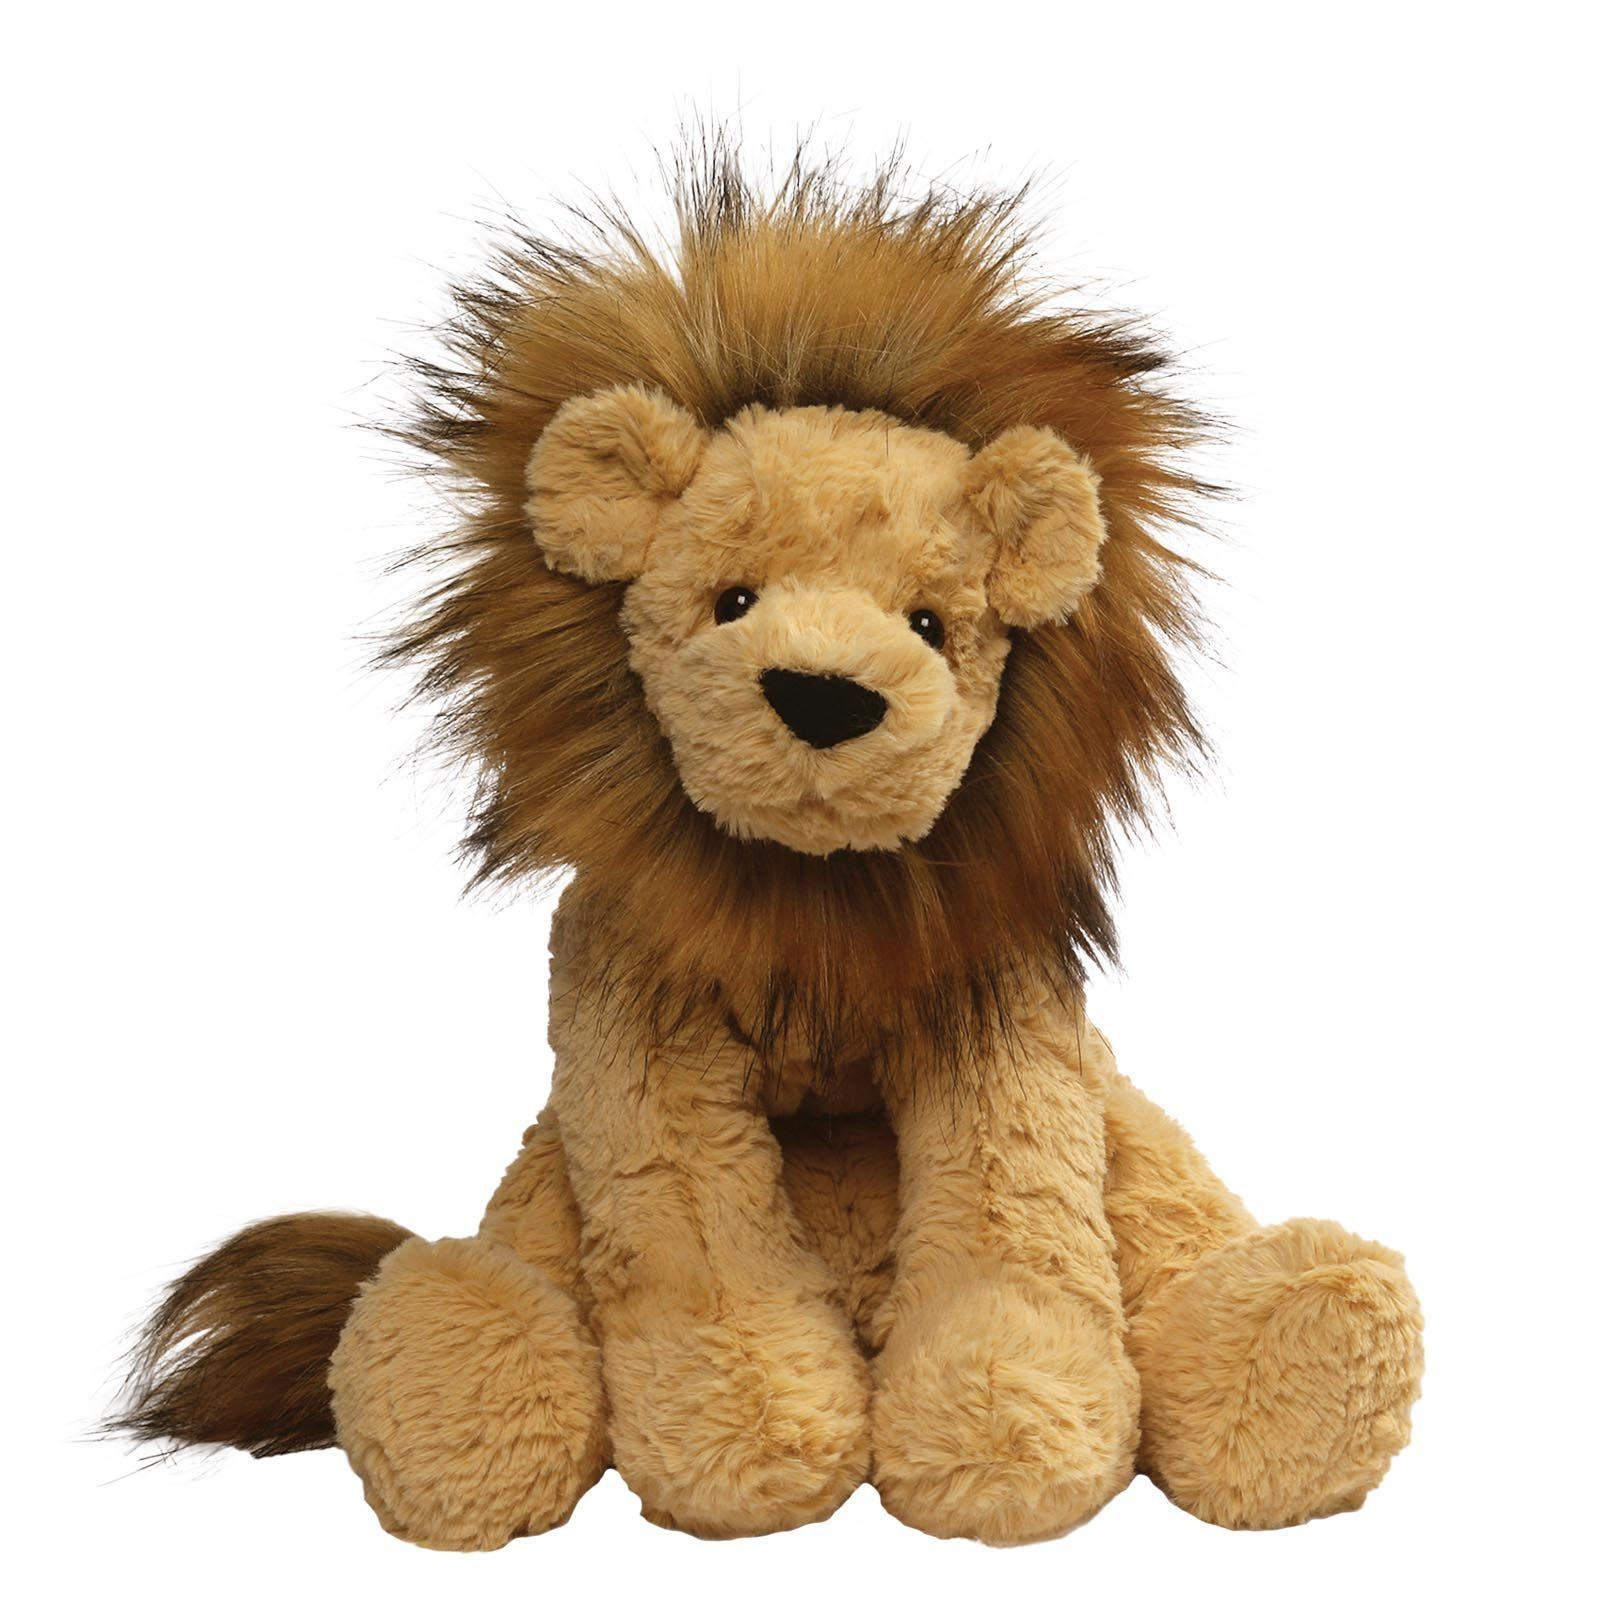 4059962 Cozys Lion Large Lion Toys Animal Plush Toys Cute Stuffed Animals [ 1600 x 1600 Pixel ]